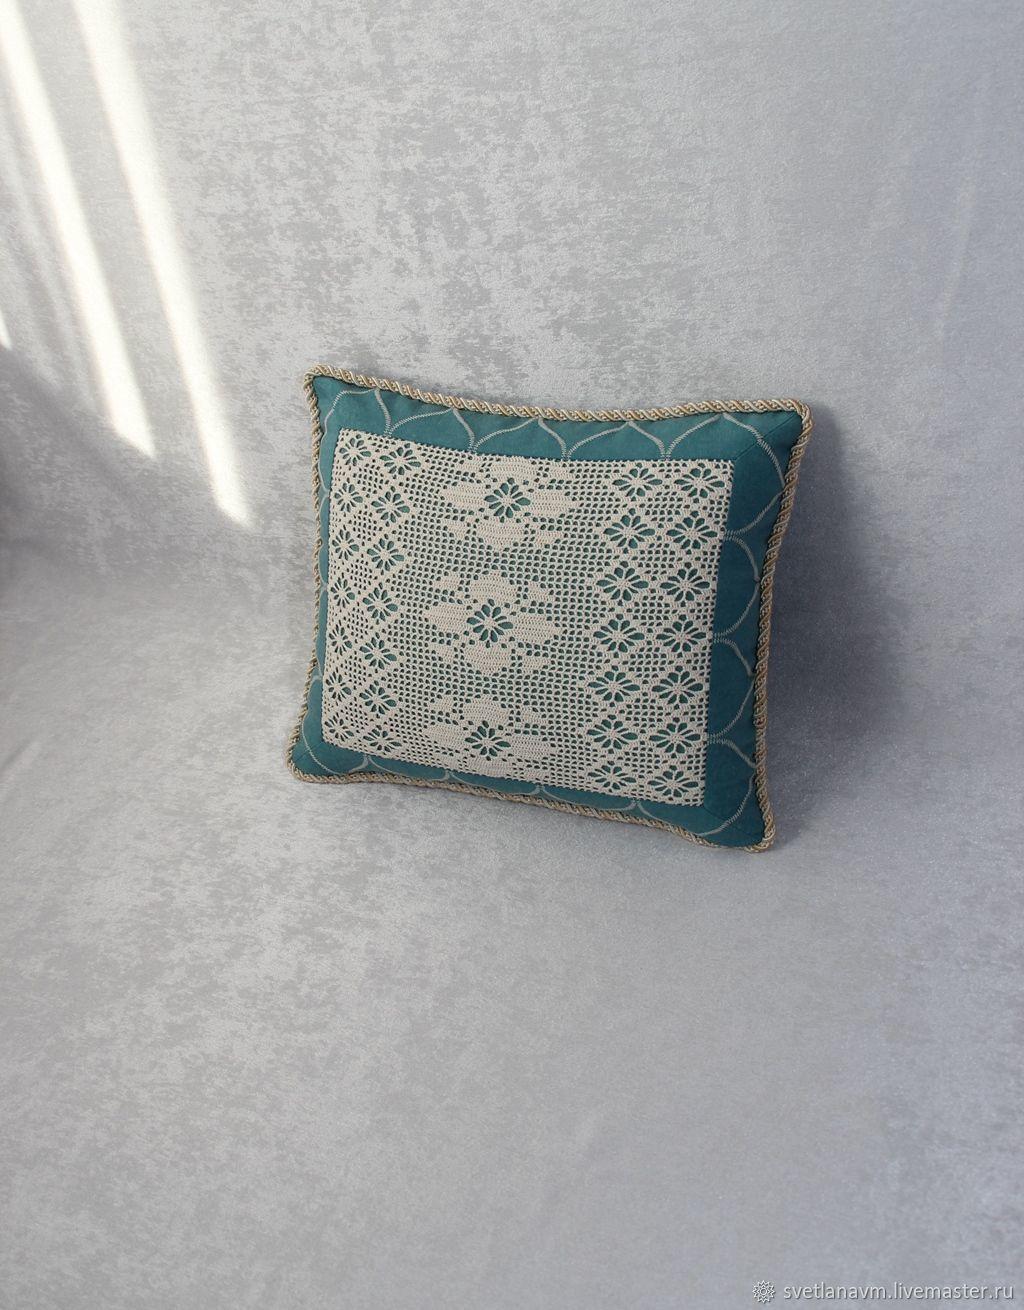 Бирюзовая подушка с кружевом, Подушки, Королев,  Фото №1